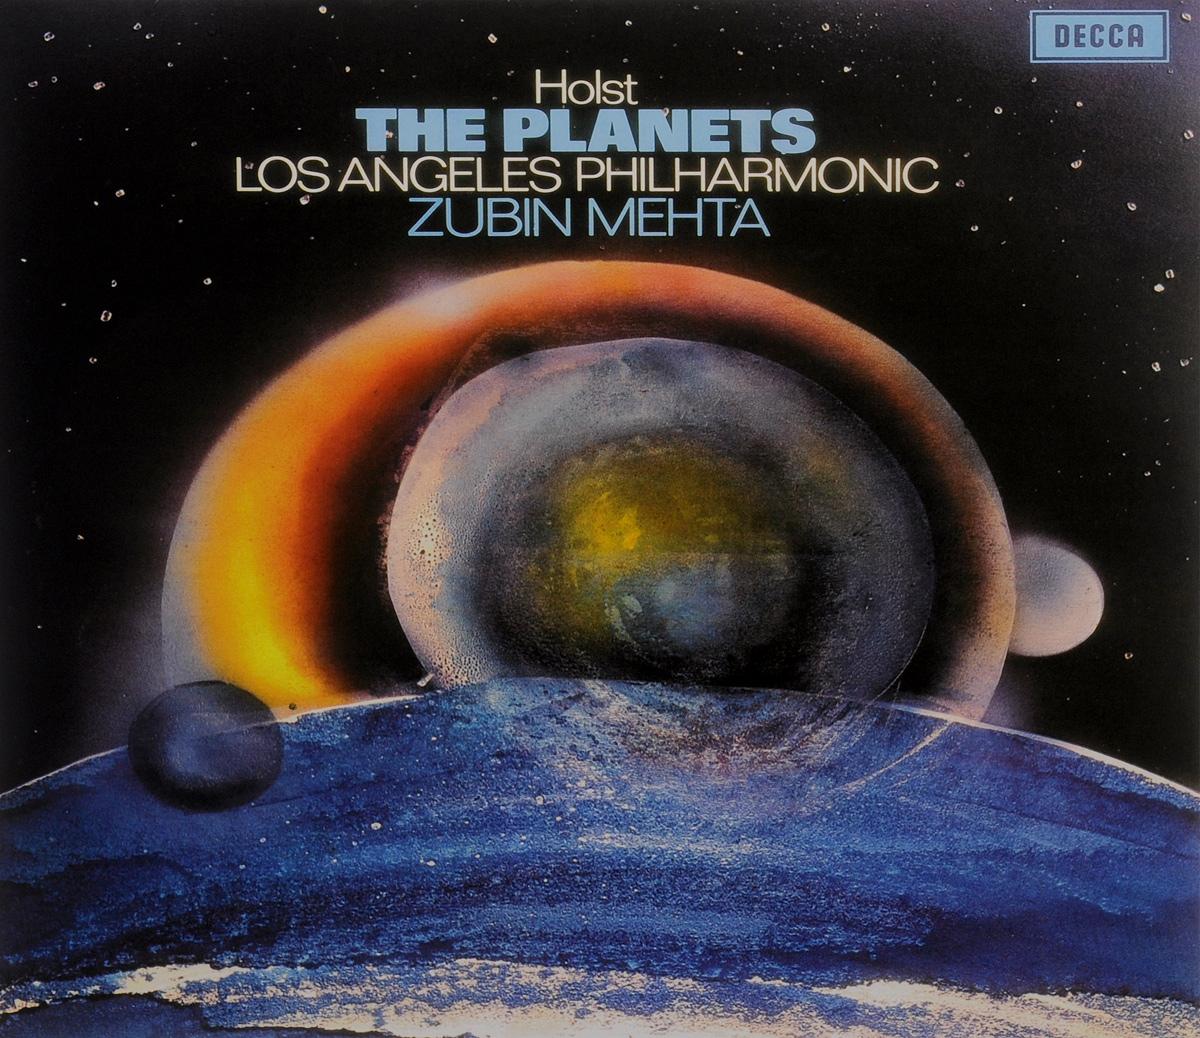 Los Angeles Philharmonic Orchestra Gustav Holst, Los Angeles Philharmonic Orchestra, Zubin Mehta. The Planets (LP) bso silverstein holst planets strauss zarathus